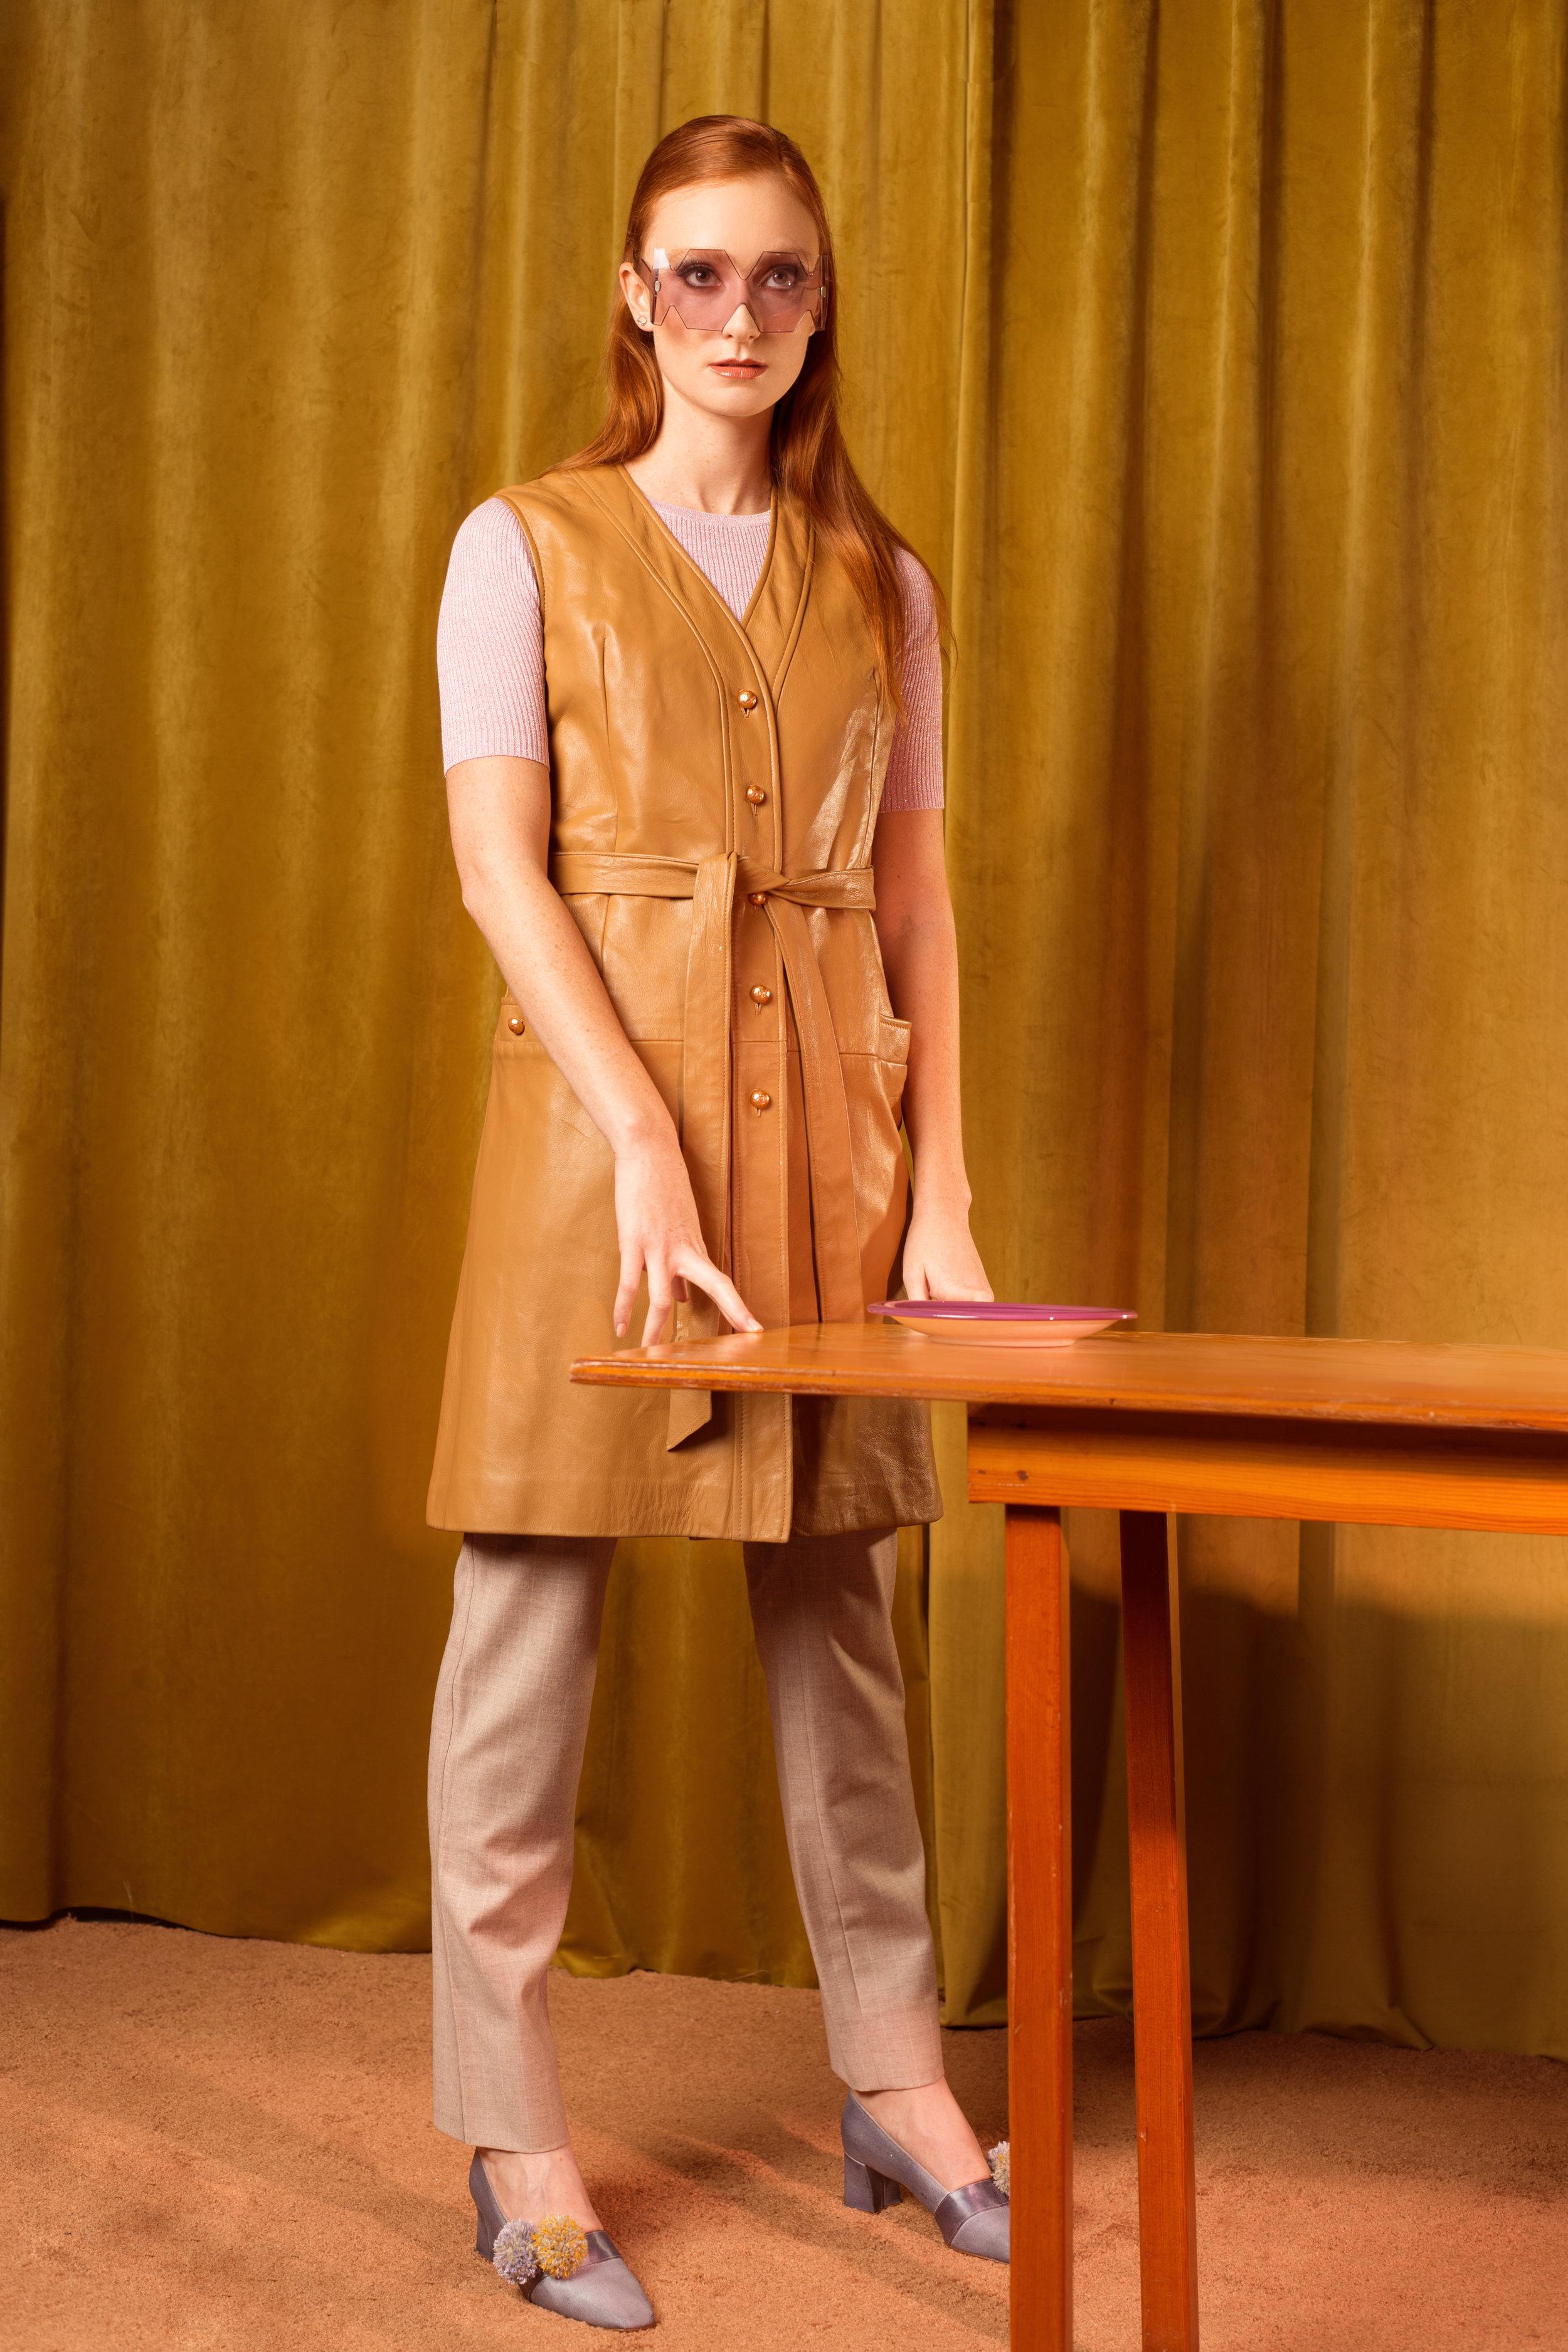 T-shirt Demylee NY  Pants: Coco Chanel  Shoes: Vintage  Pompom shoes: Claire Drennan Knitwear  Vest: Vintage